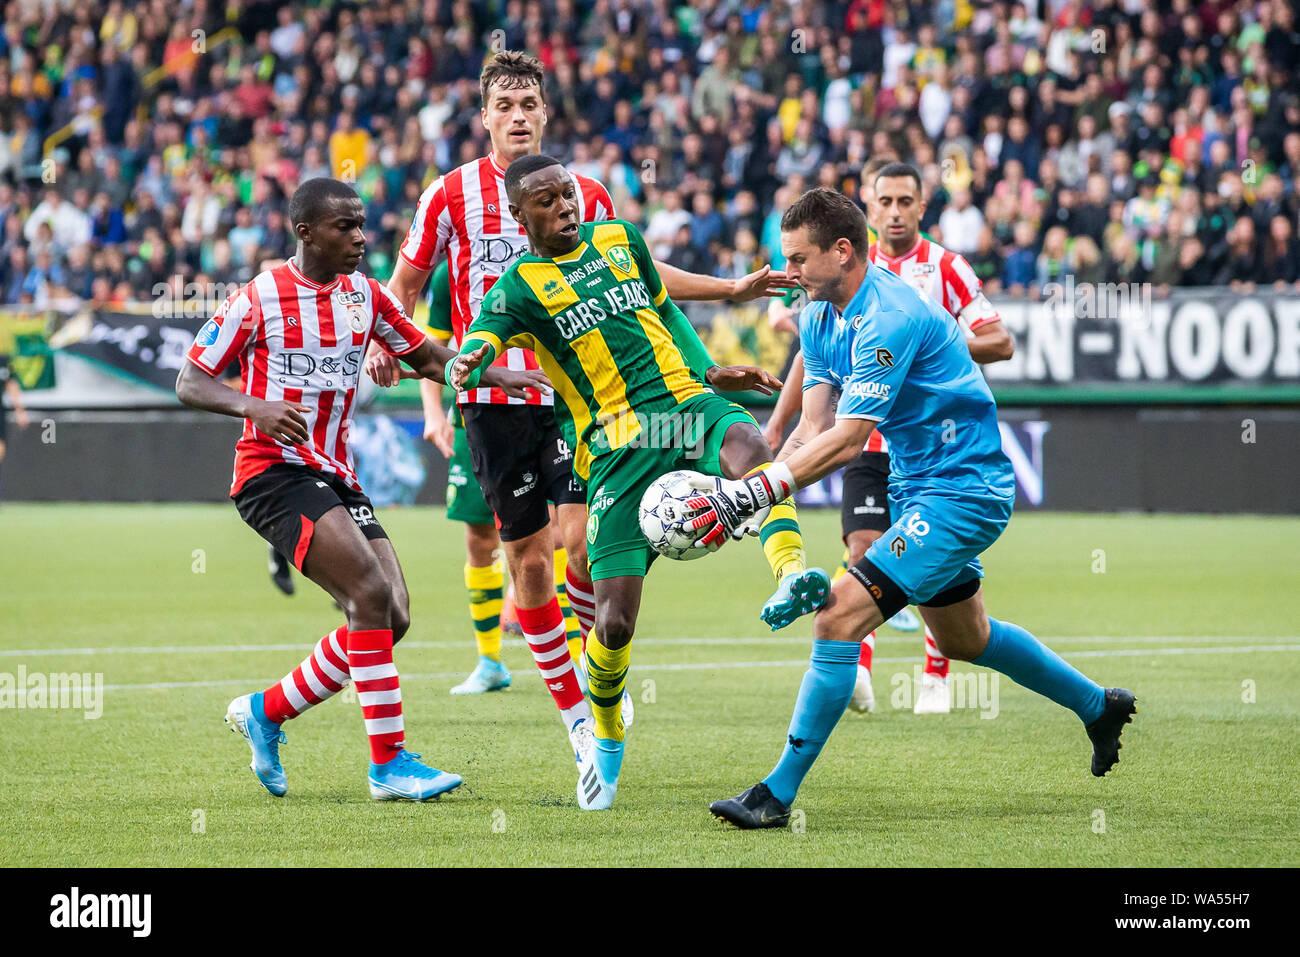 Den Haag Netherlands 17th Aug 2019 Cars Jeans Stadion Season 2019 2020 Football Dutch Eredivisie Ado